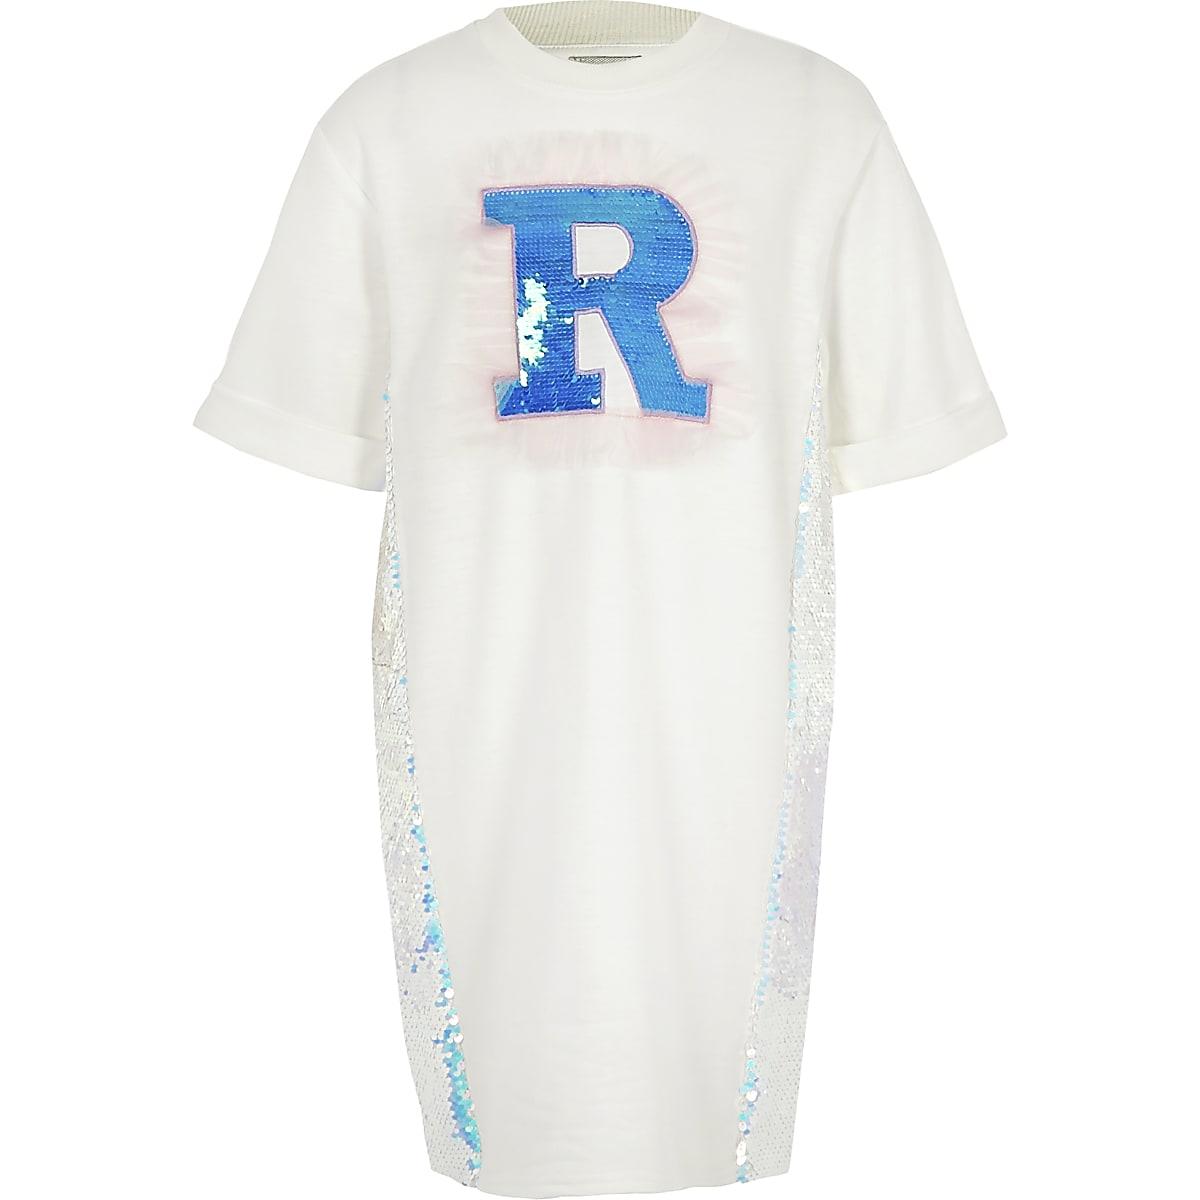 Girls white sequin R T-shirt dress